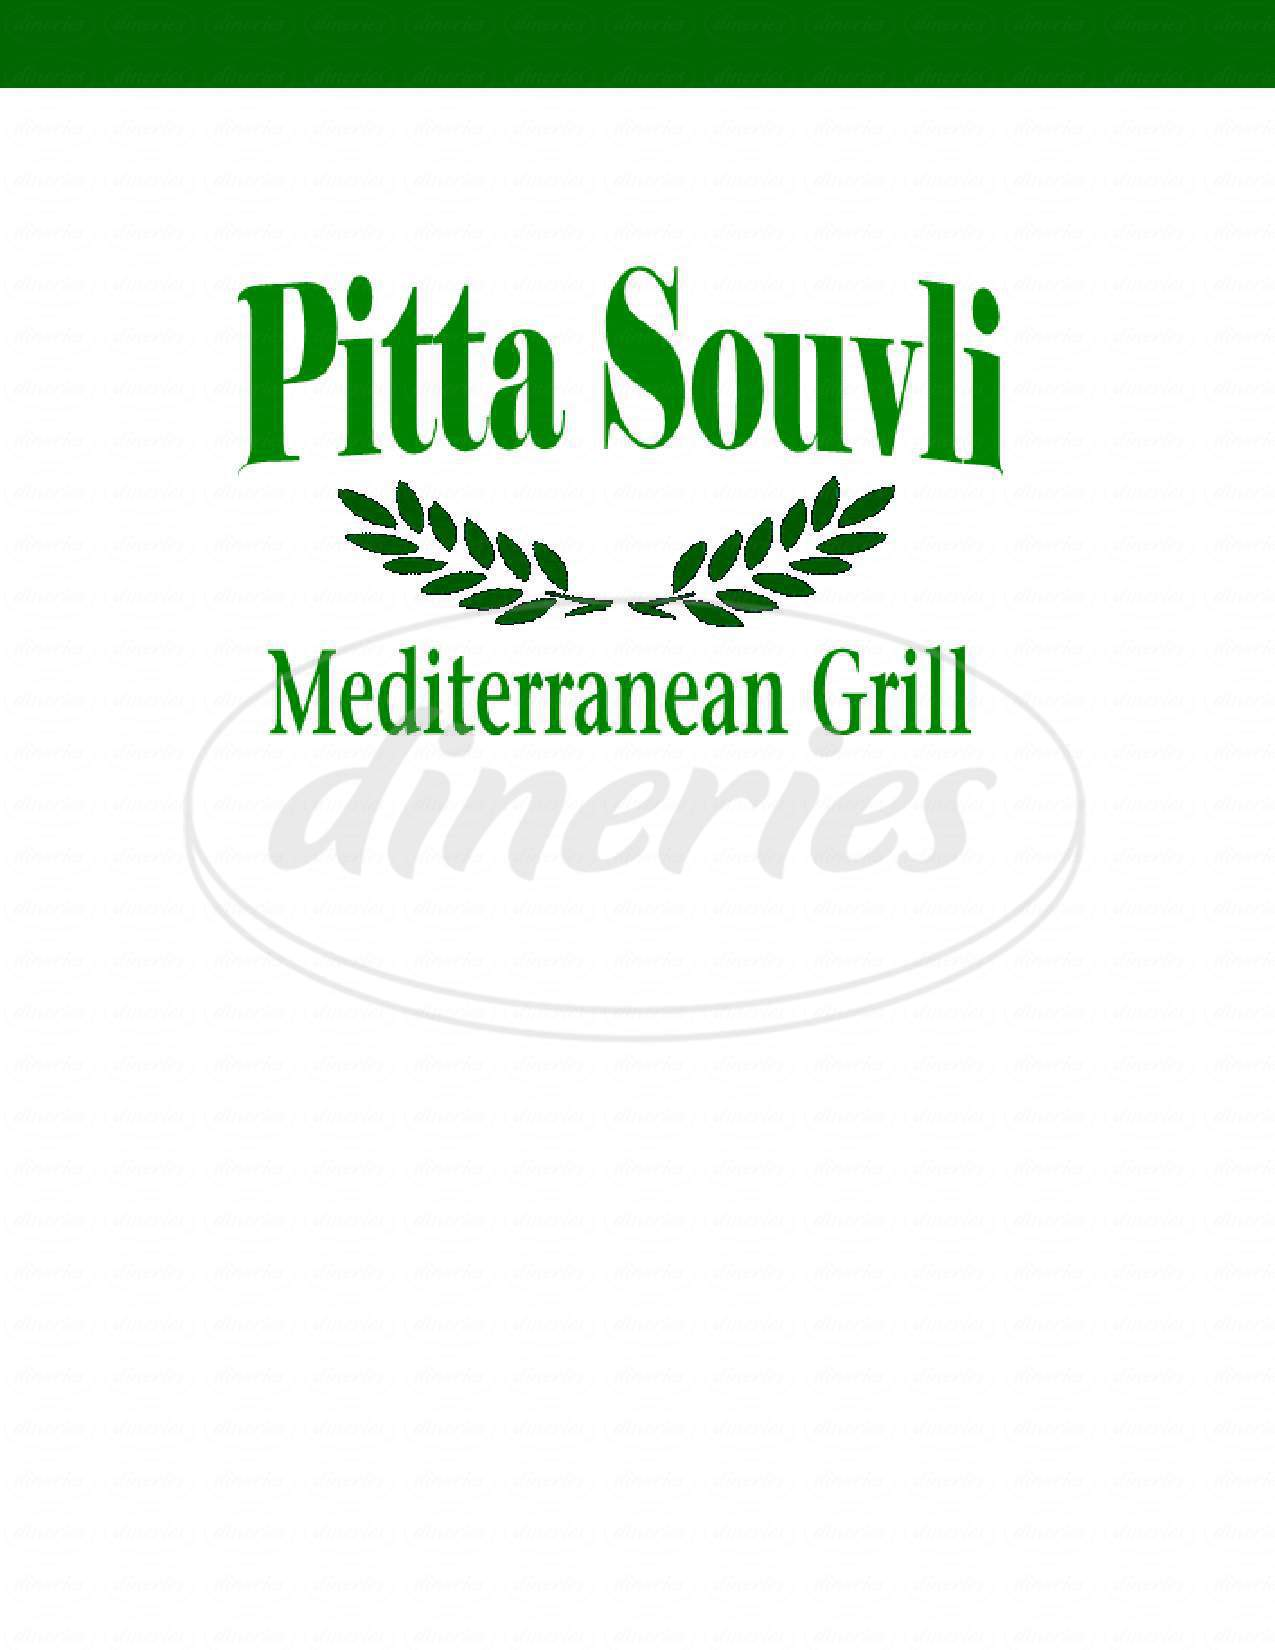 menu for Pitta Souvli